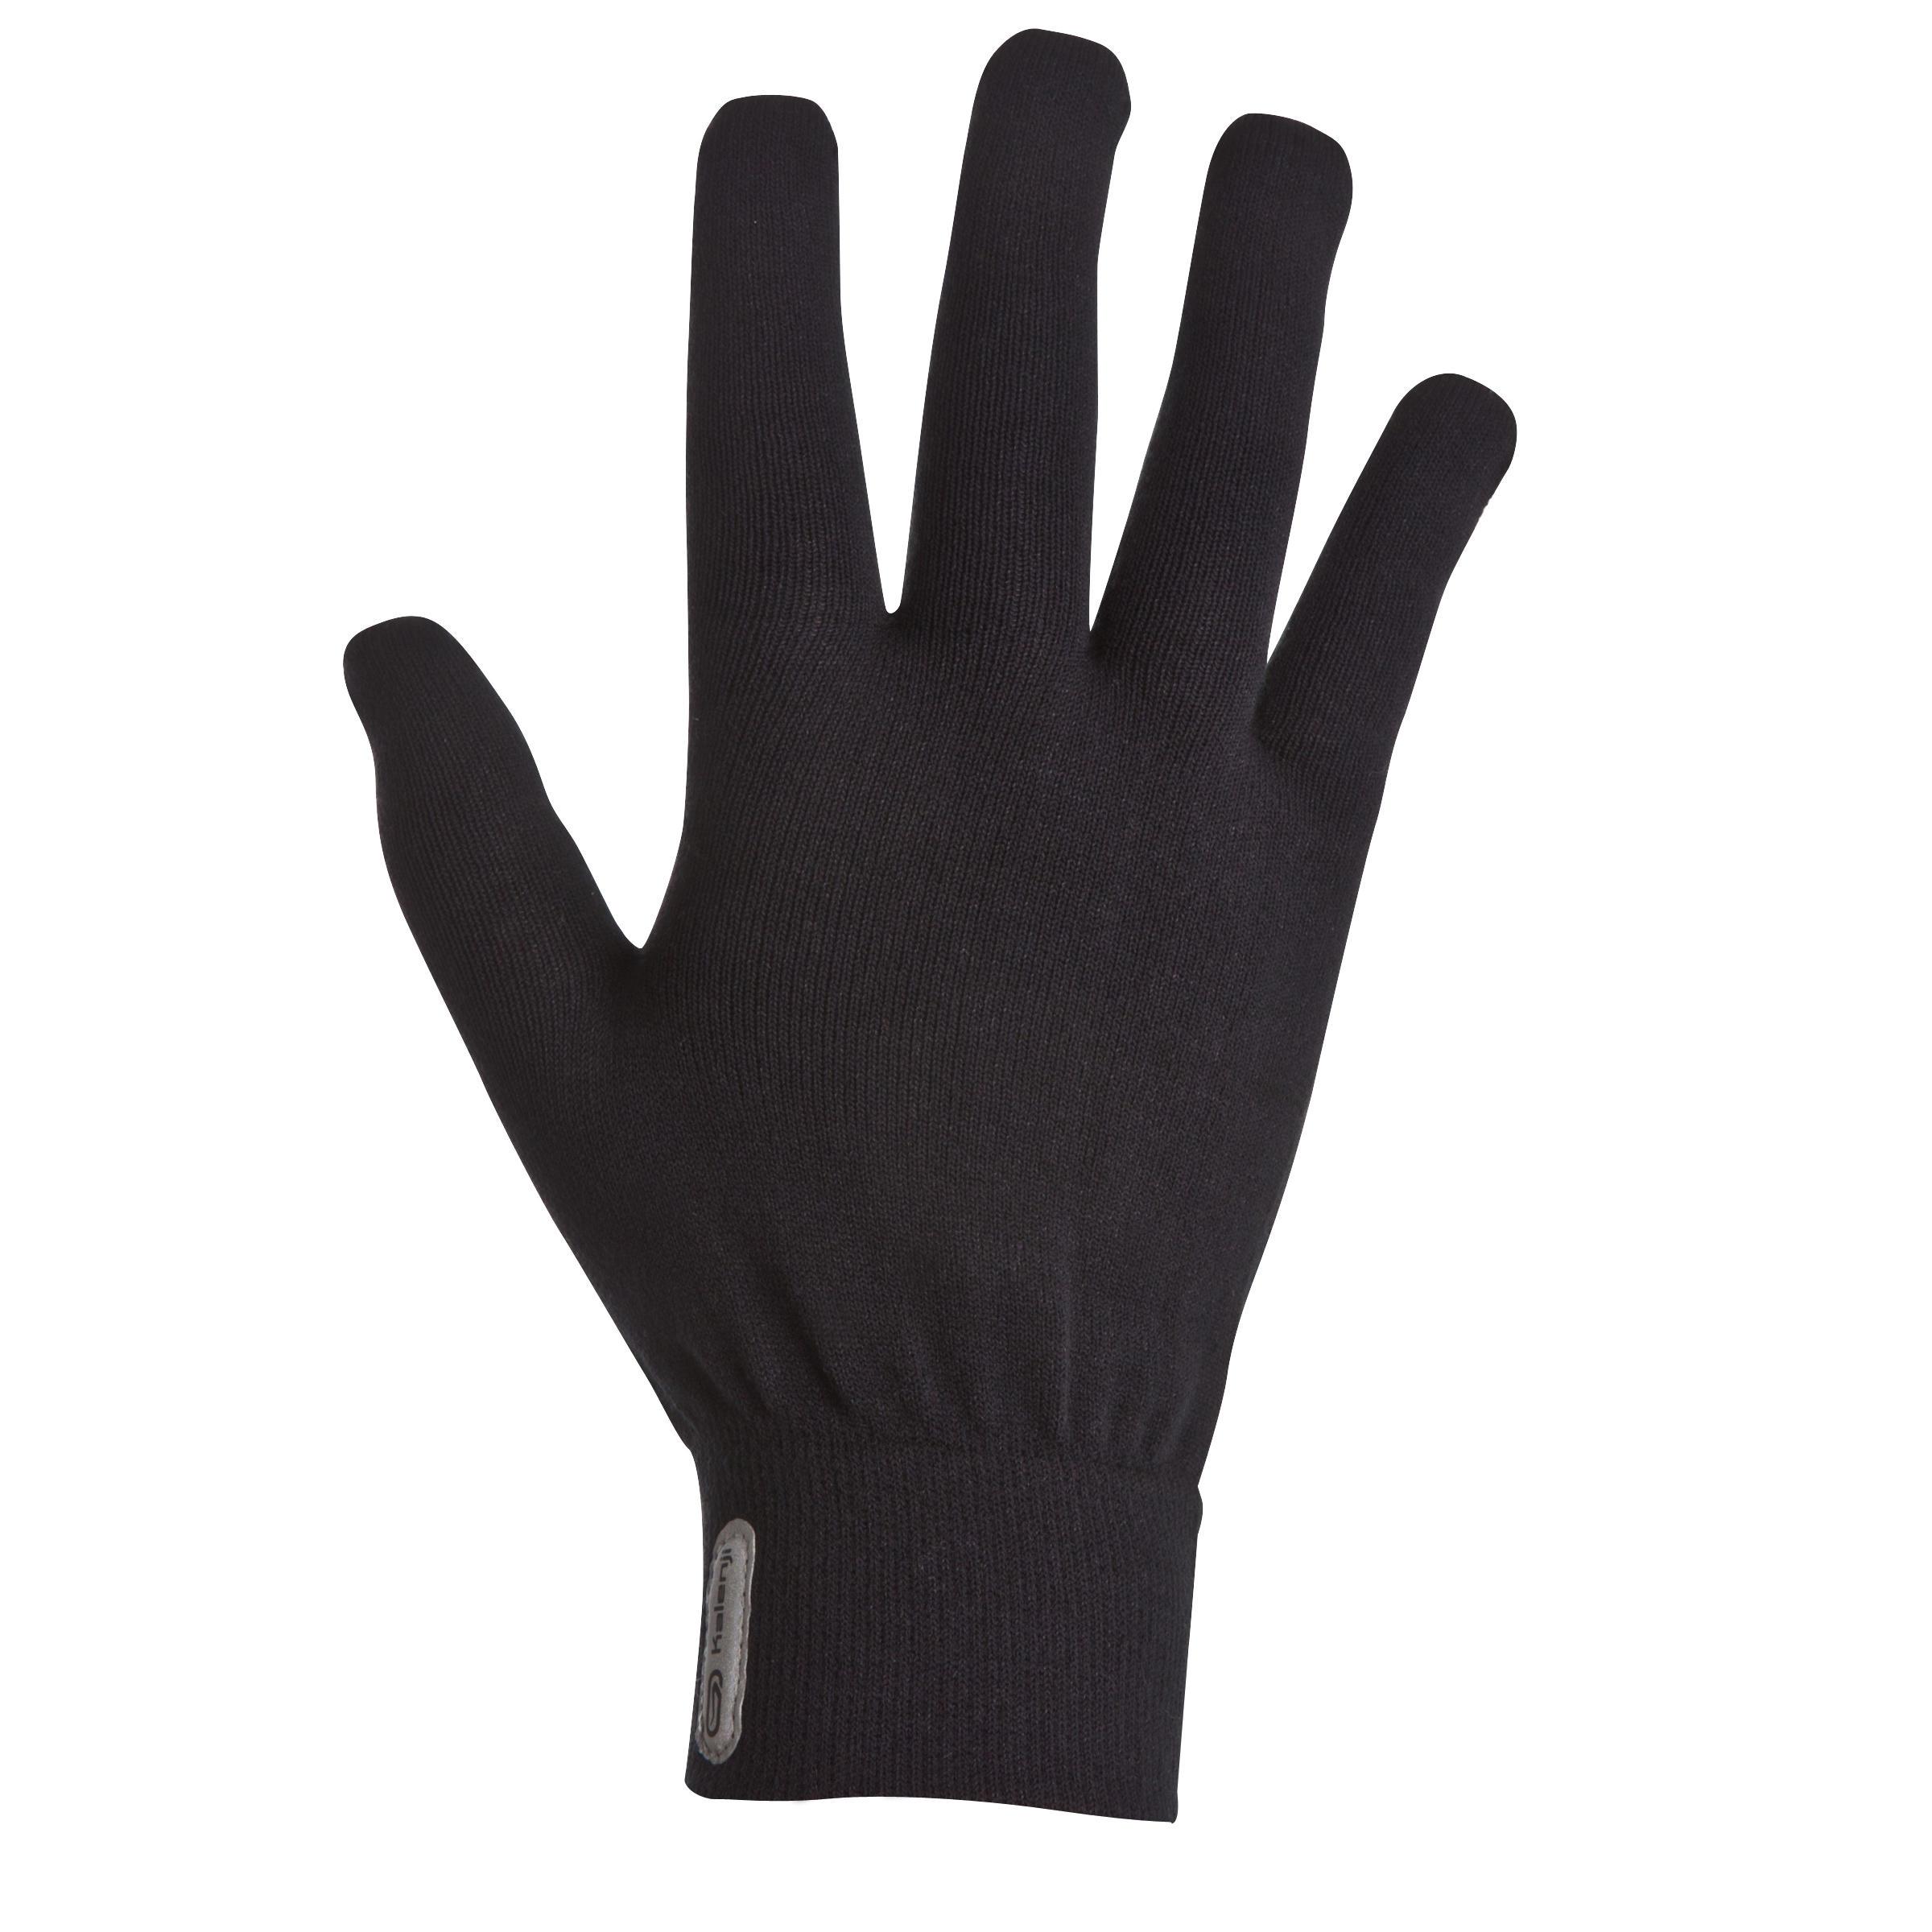 Seamless children's athletics gloves - black